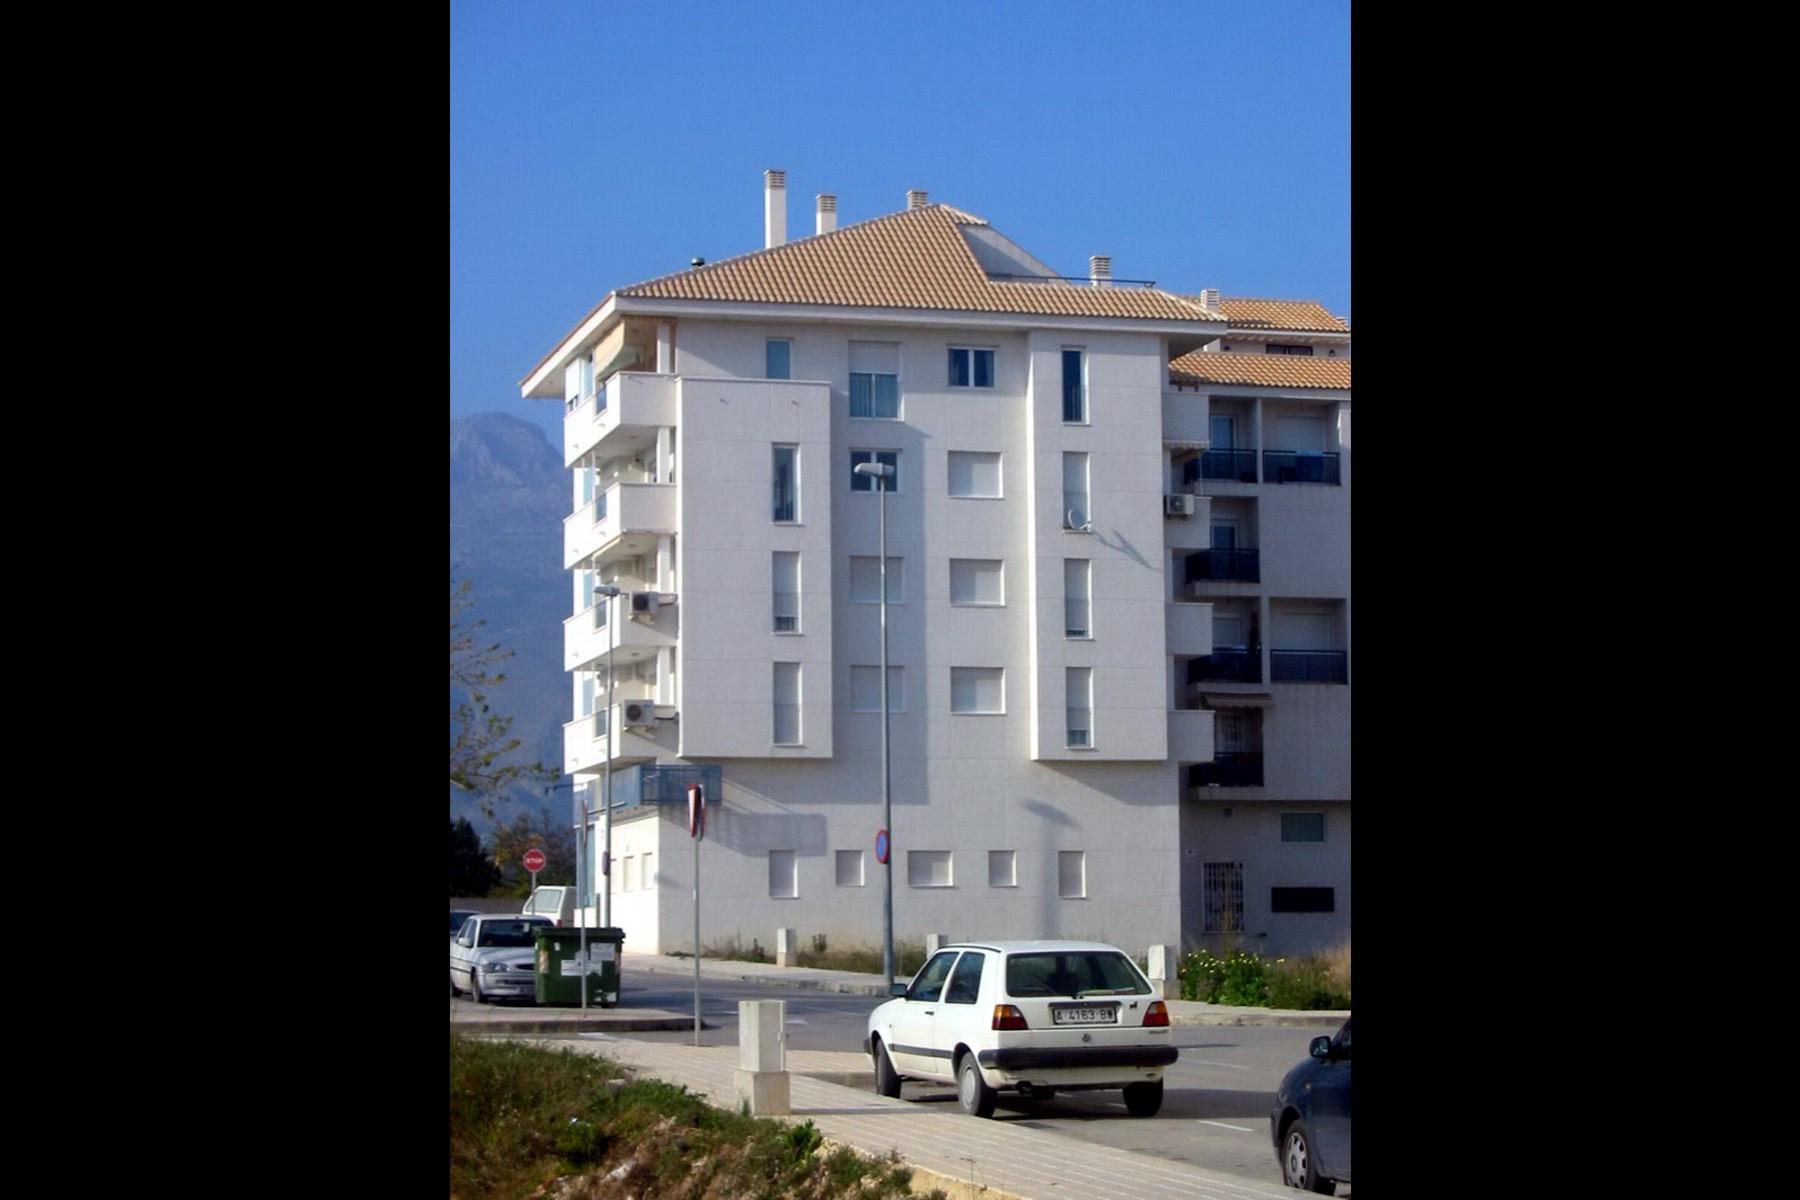 Imaginarq-053-Edificio-Viviendas-Altea-Alicante-05A